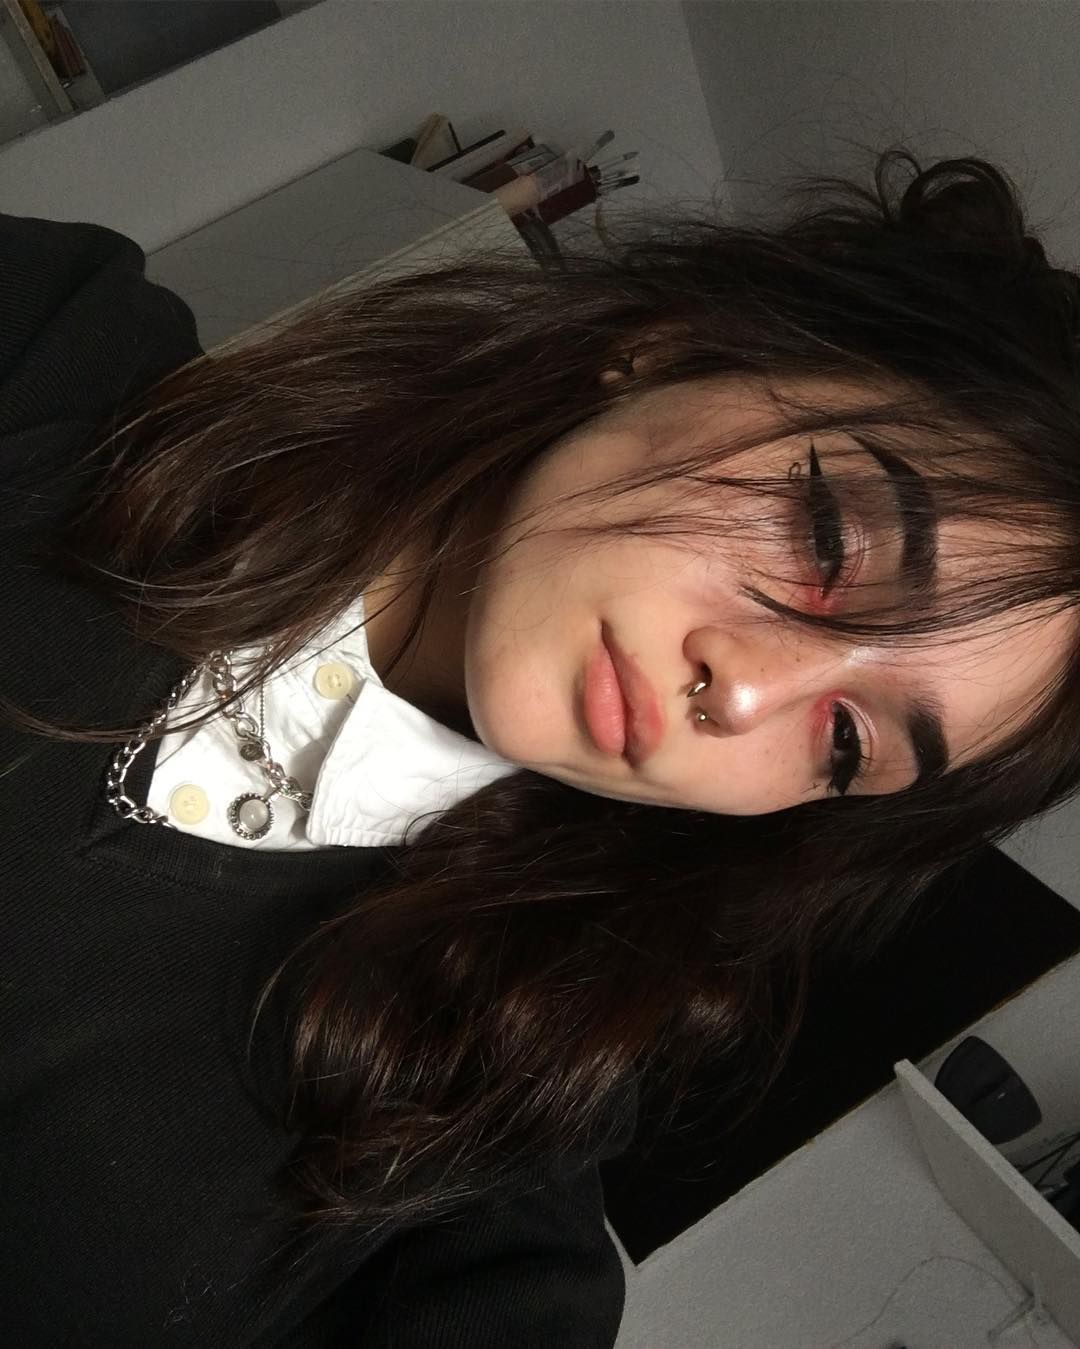 Makeup Aesthetic Grunge Makeup Aesthetic In 2020 Edgy Makeup Grunge Makeup Black Hair Aesthetic